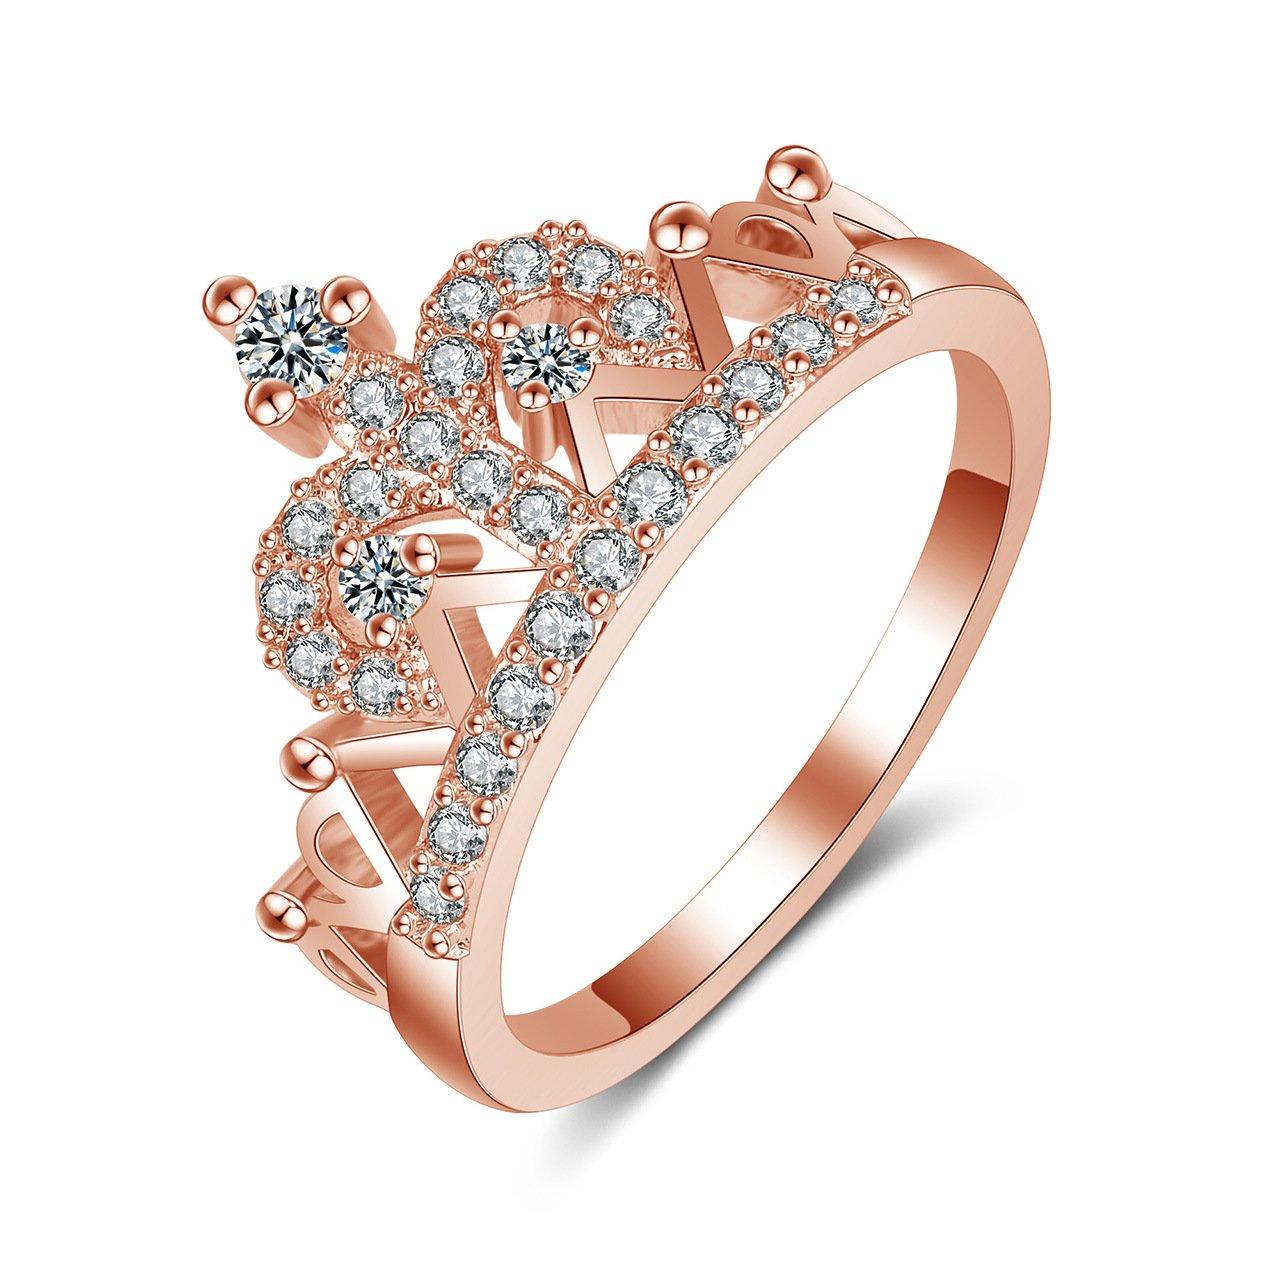 Qutool Tiara Princess Rose-Golden Queen Shape Ring Crown Rings Cubic Zirconia Tara Rings for Women/Mother/Girls/Daughters Ring-H